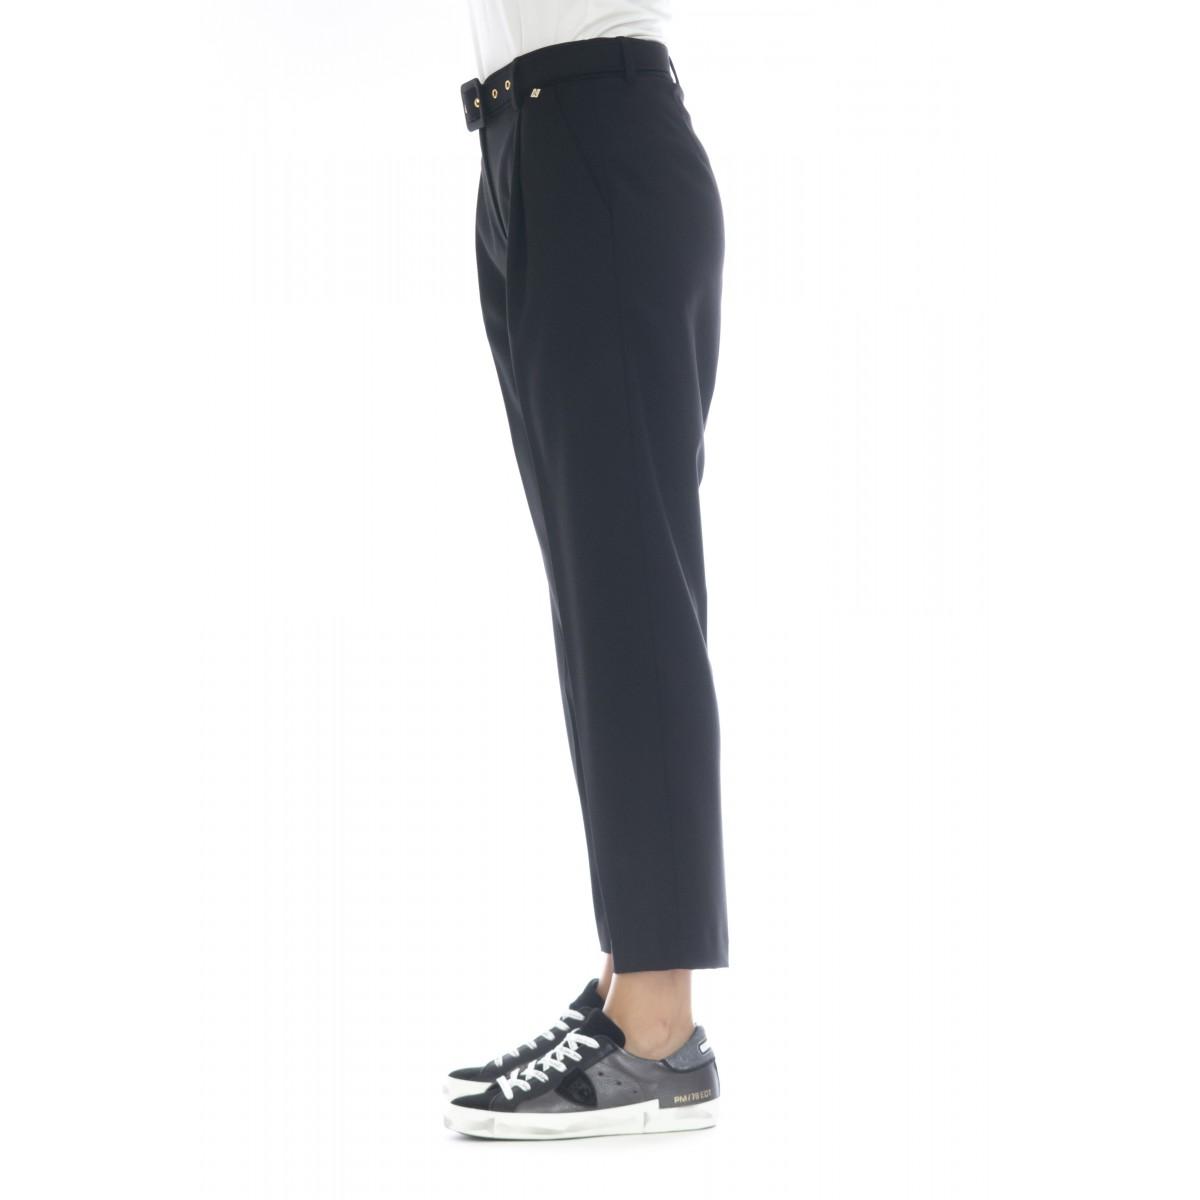 Pantalone donna - Boa pantalone cintura vita alta